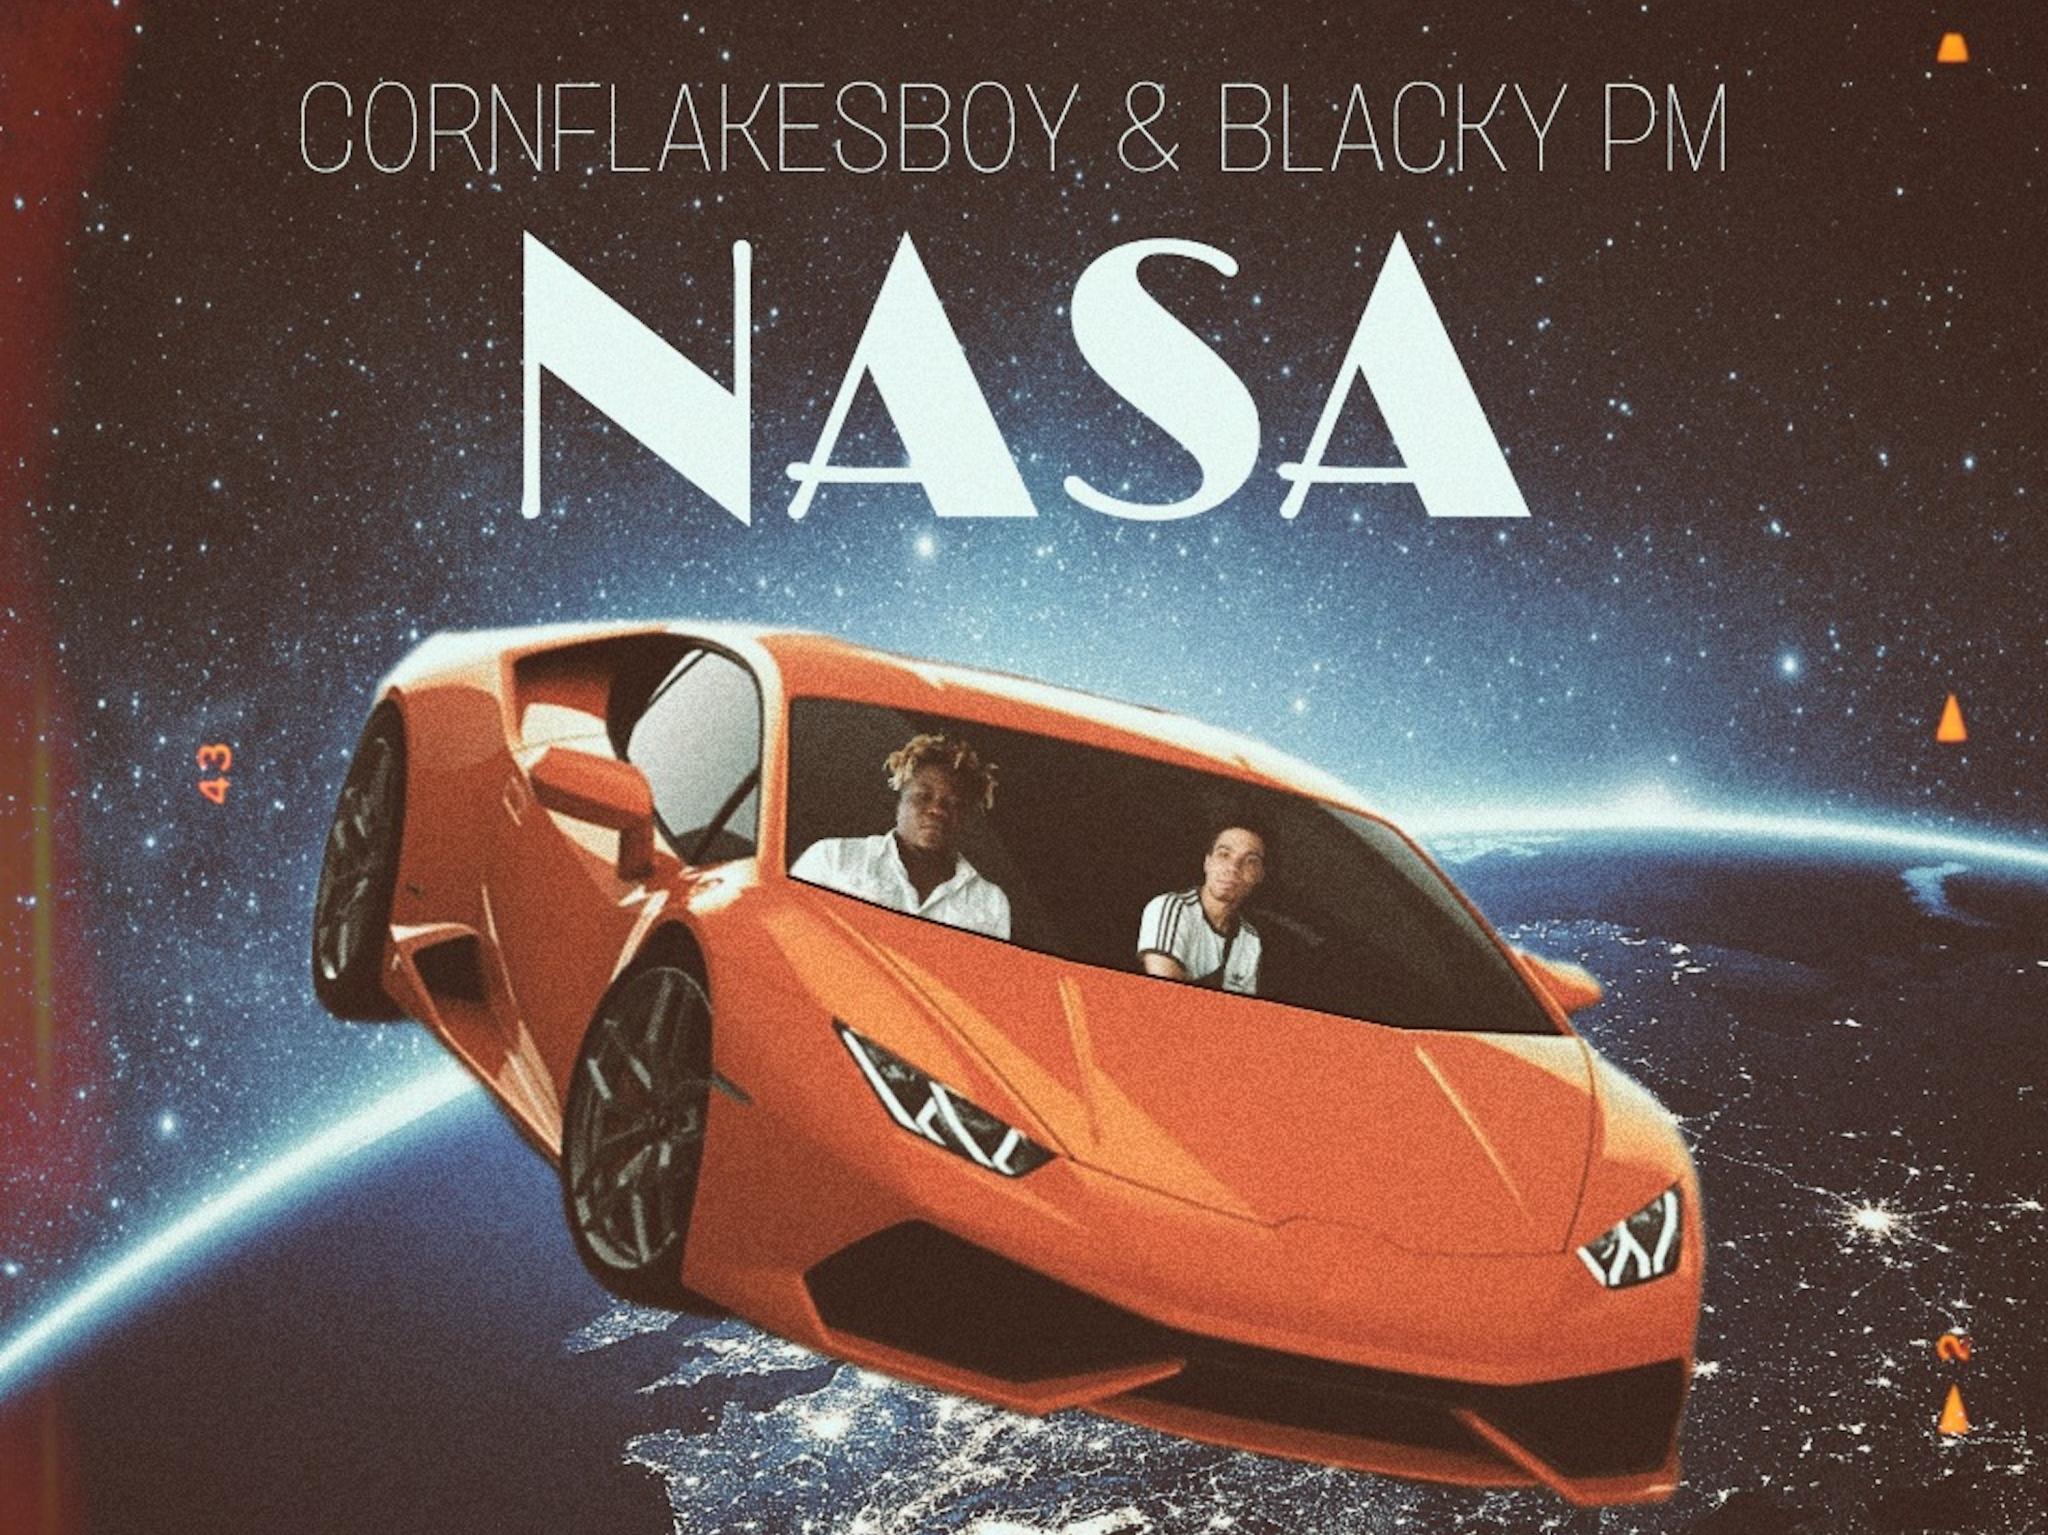 Songcover von Cornflakesboy's NASA Song. Foto: Cornflakesboy.